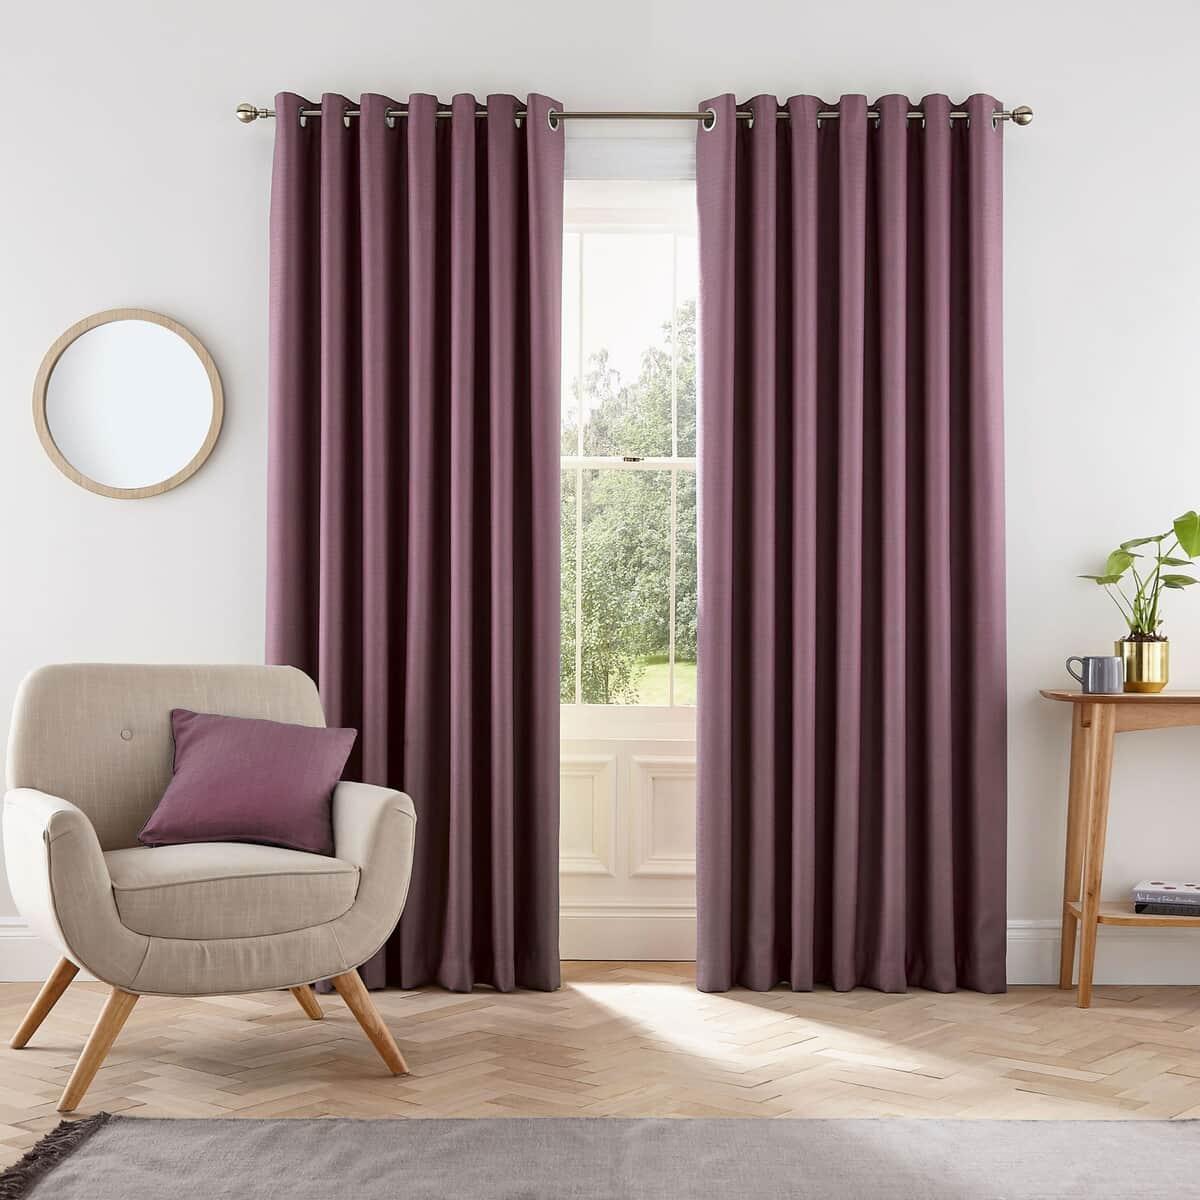 Helena Springfield Eden Grape Curtains large